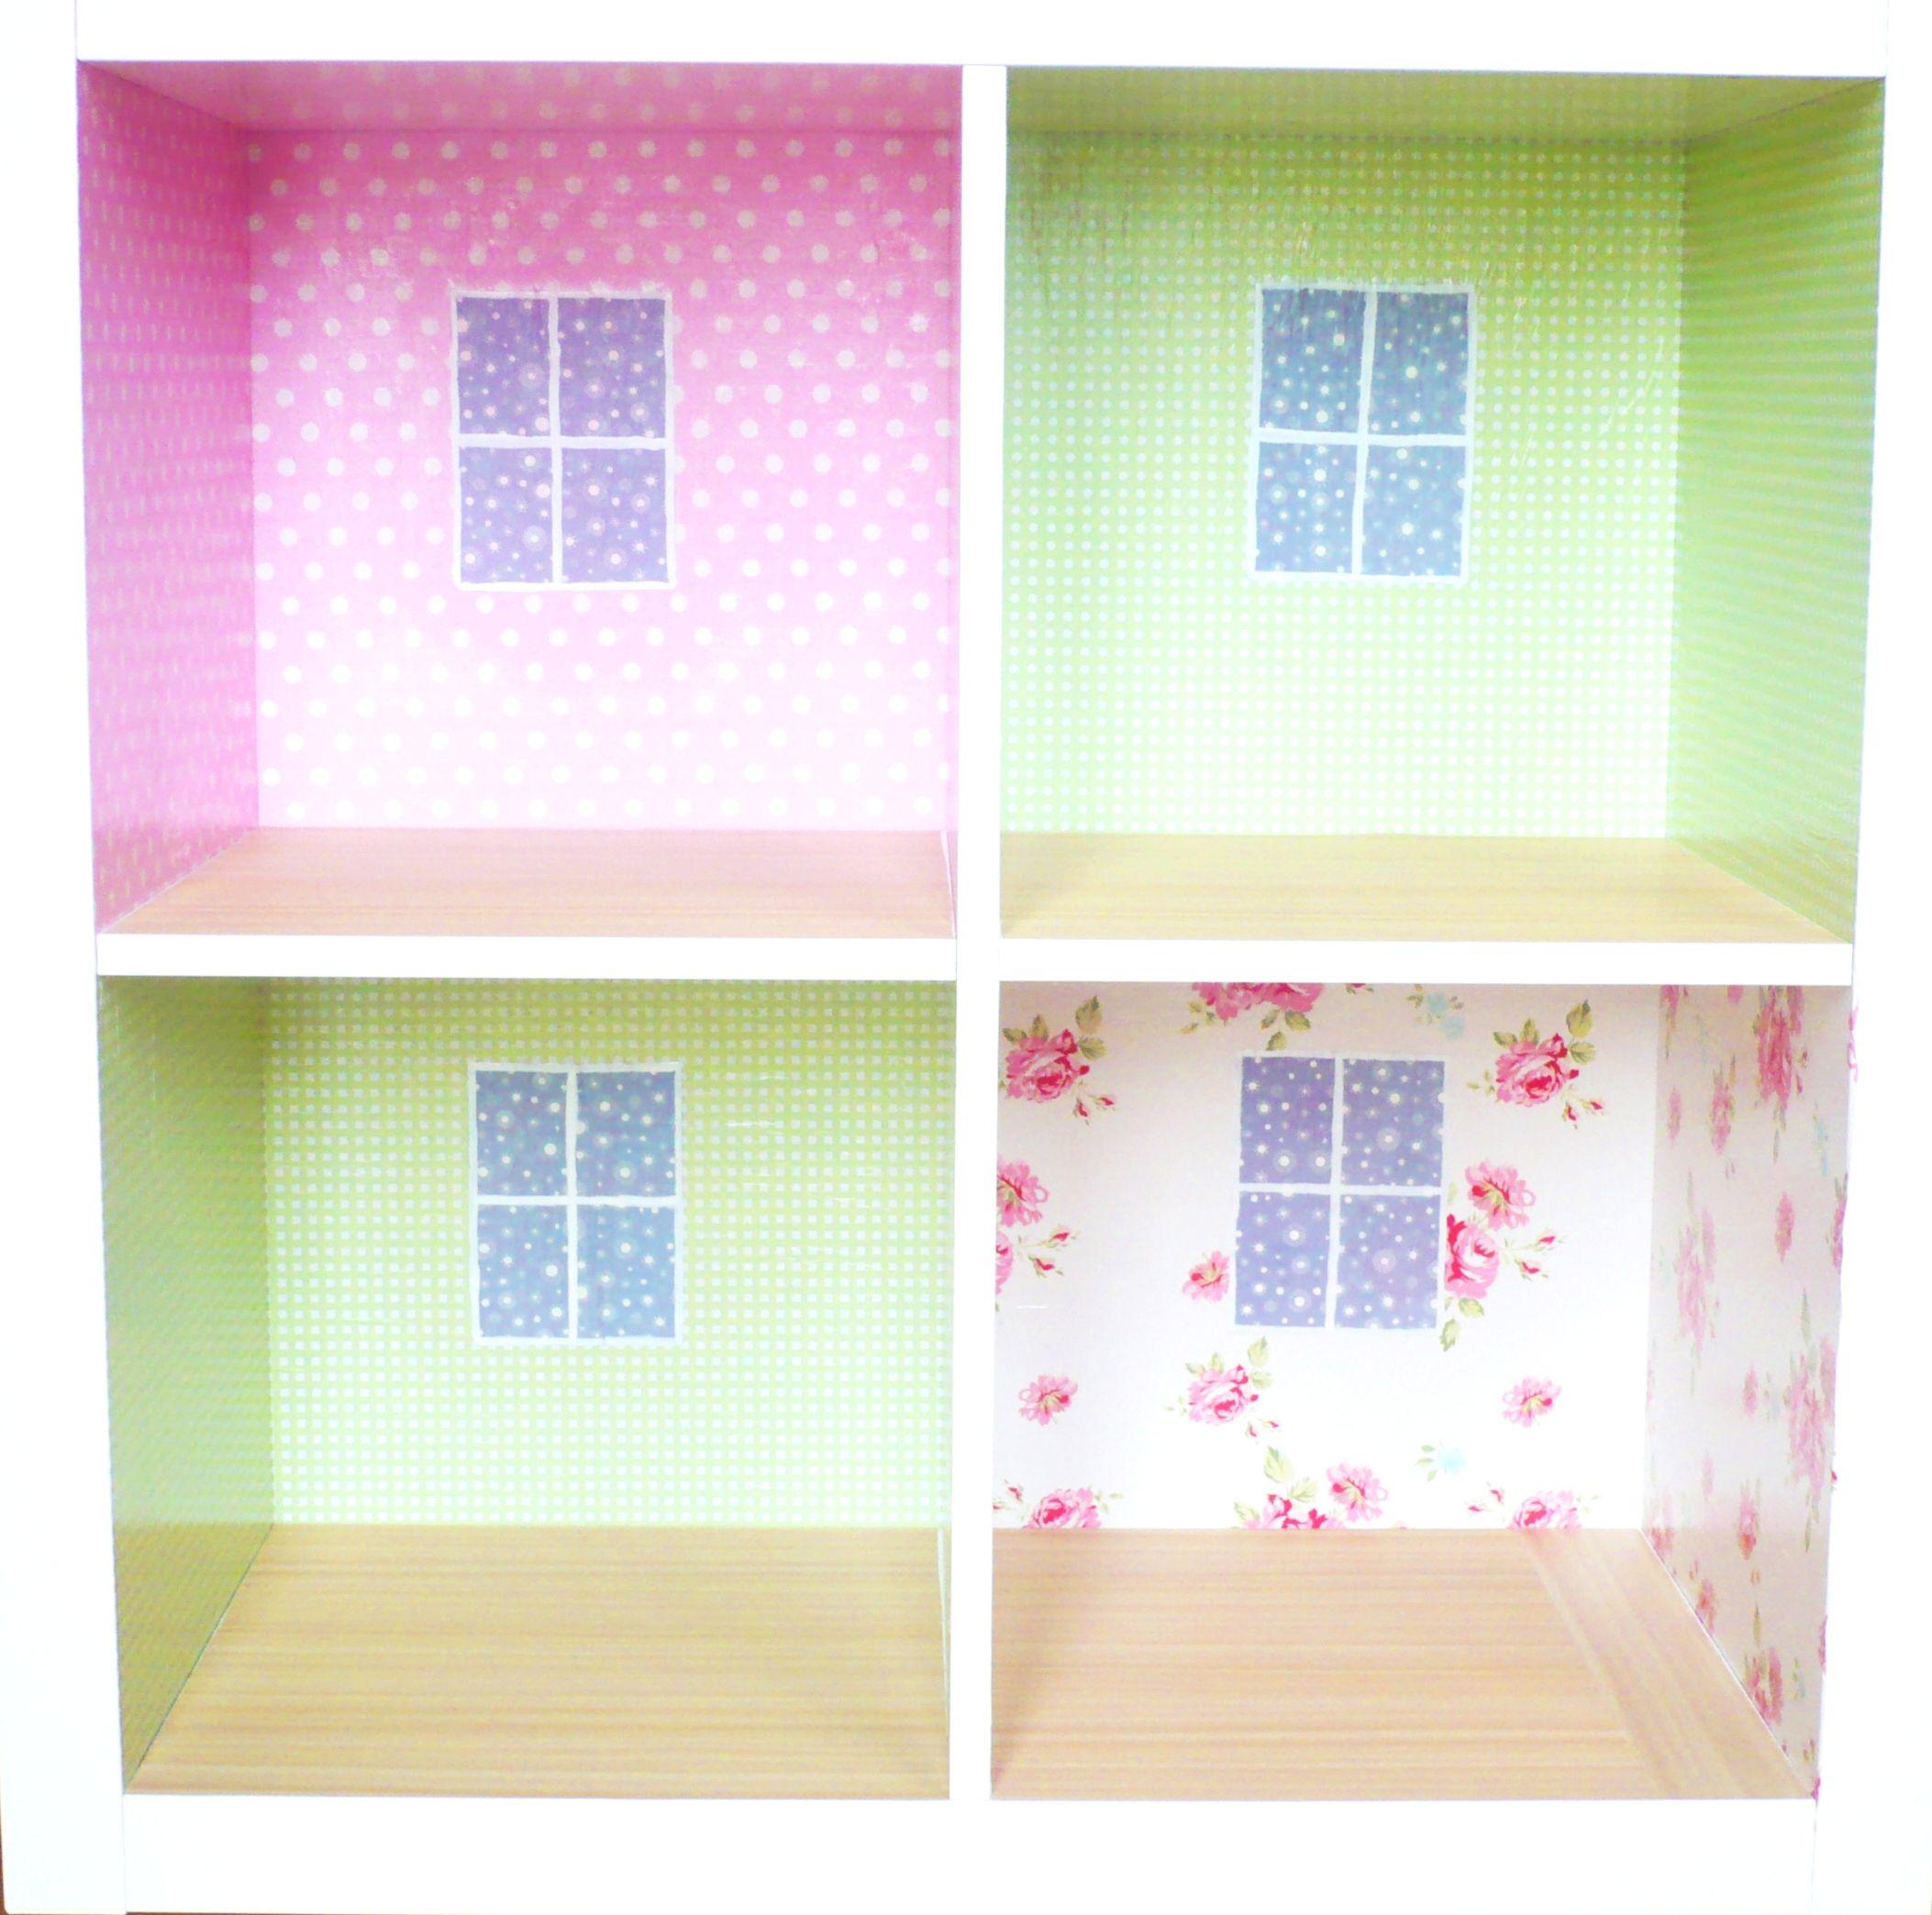 Suchergebnisse Puppenhaus Puppenhaus Barbie Haus Diy Puppenhaus